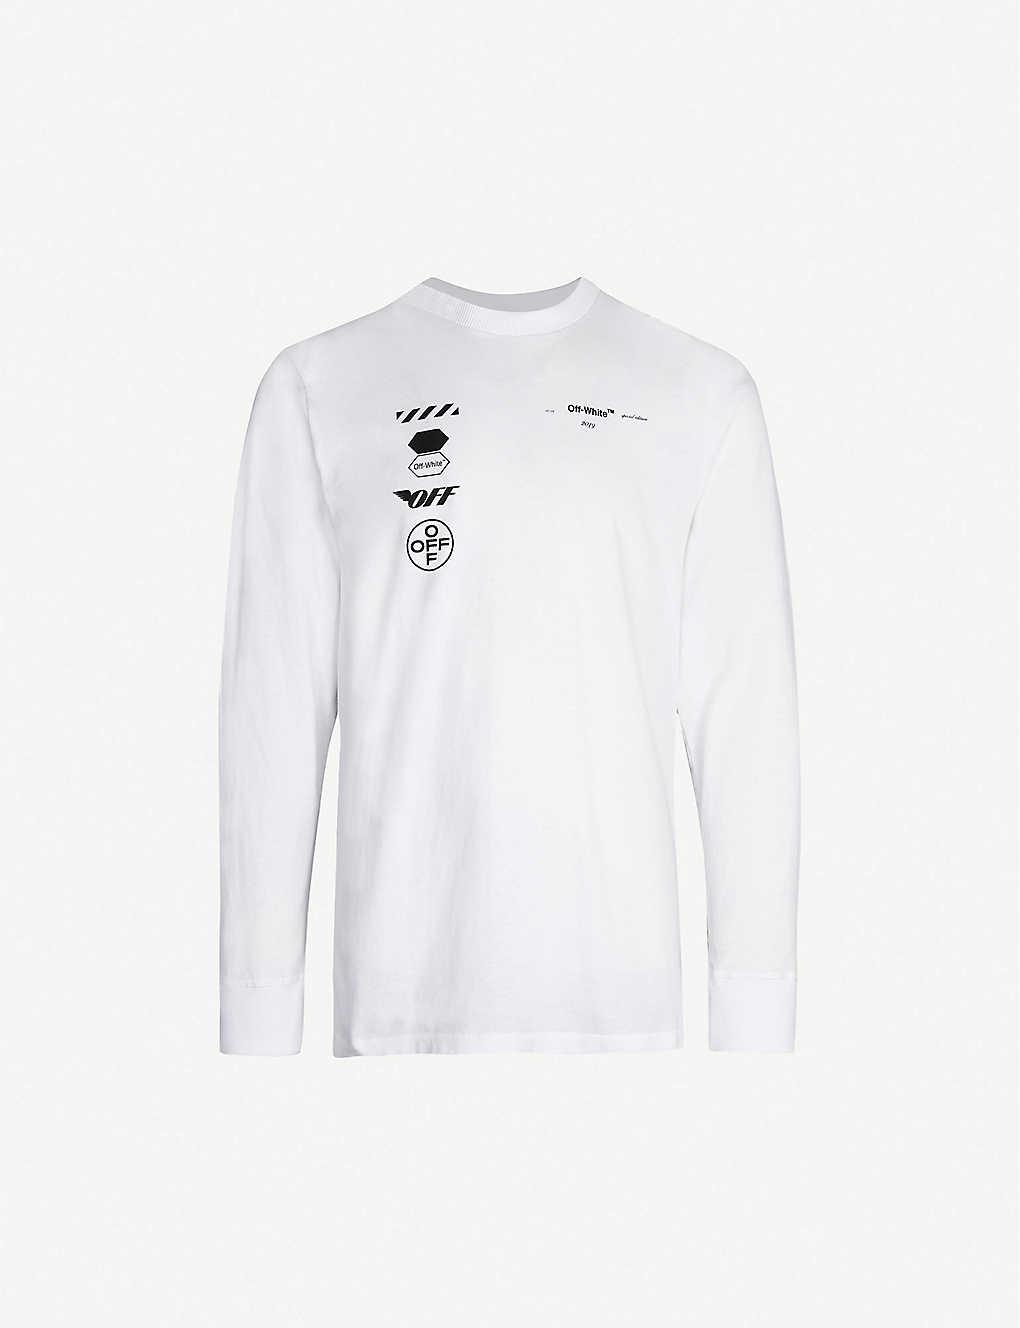 e74cde8a3e Off White Virgil Abloh Long Sleeve T Shirt - raveitsafe